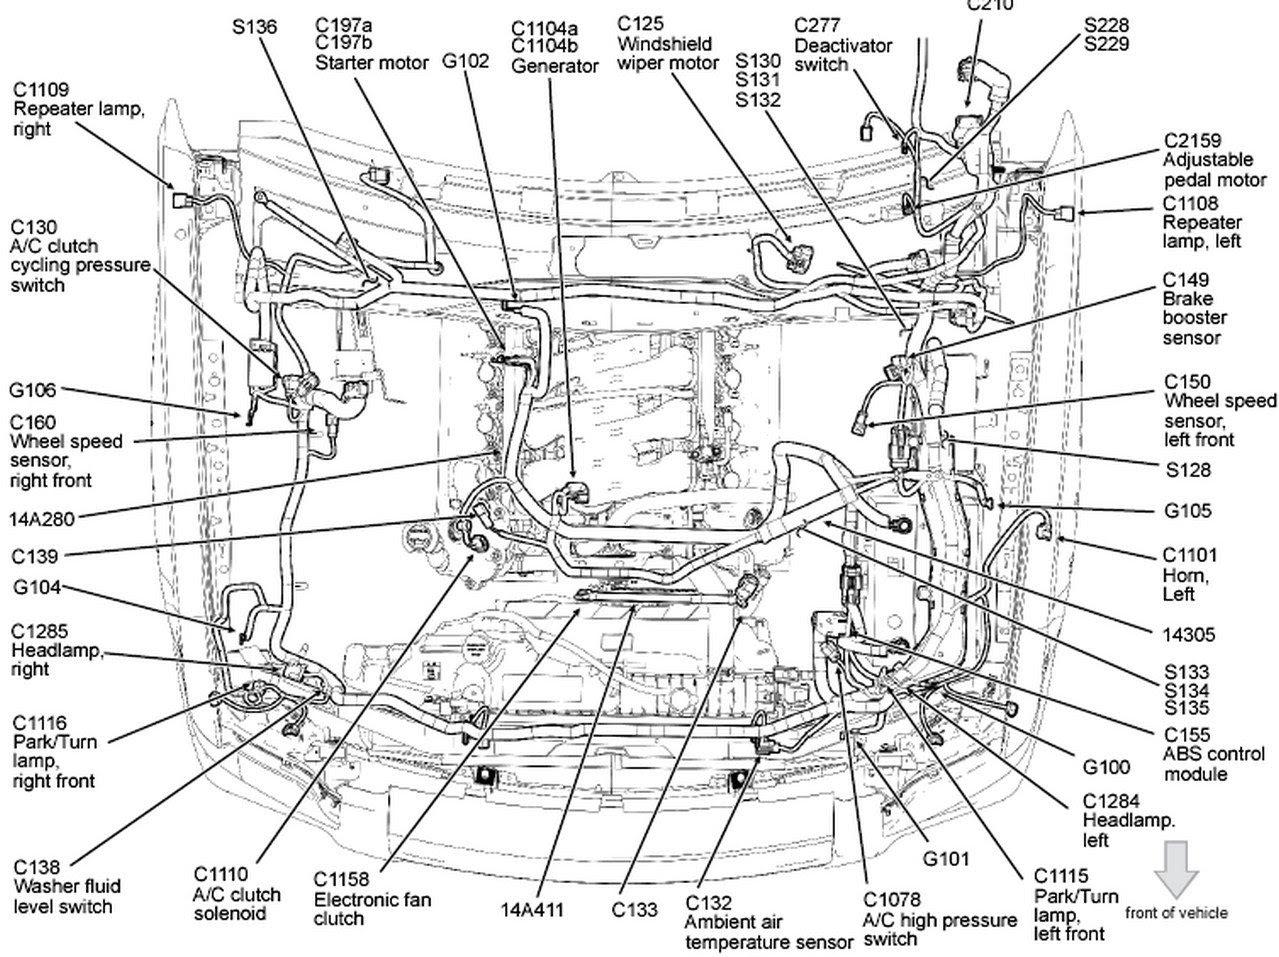 2002 ford mustang engine diagram 2000 explorer engine diagram dat wiring diagrams  2000 explorer engine diagram dat